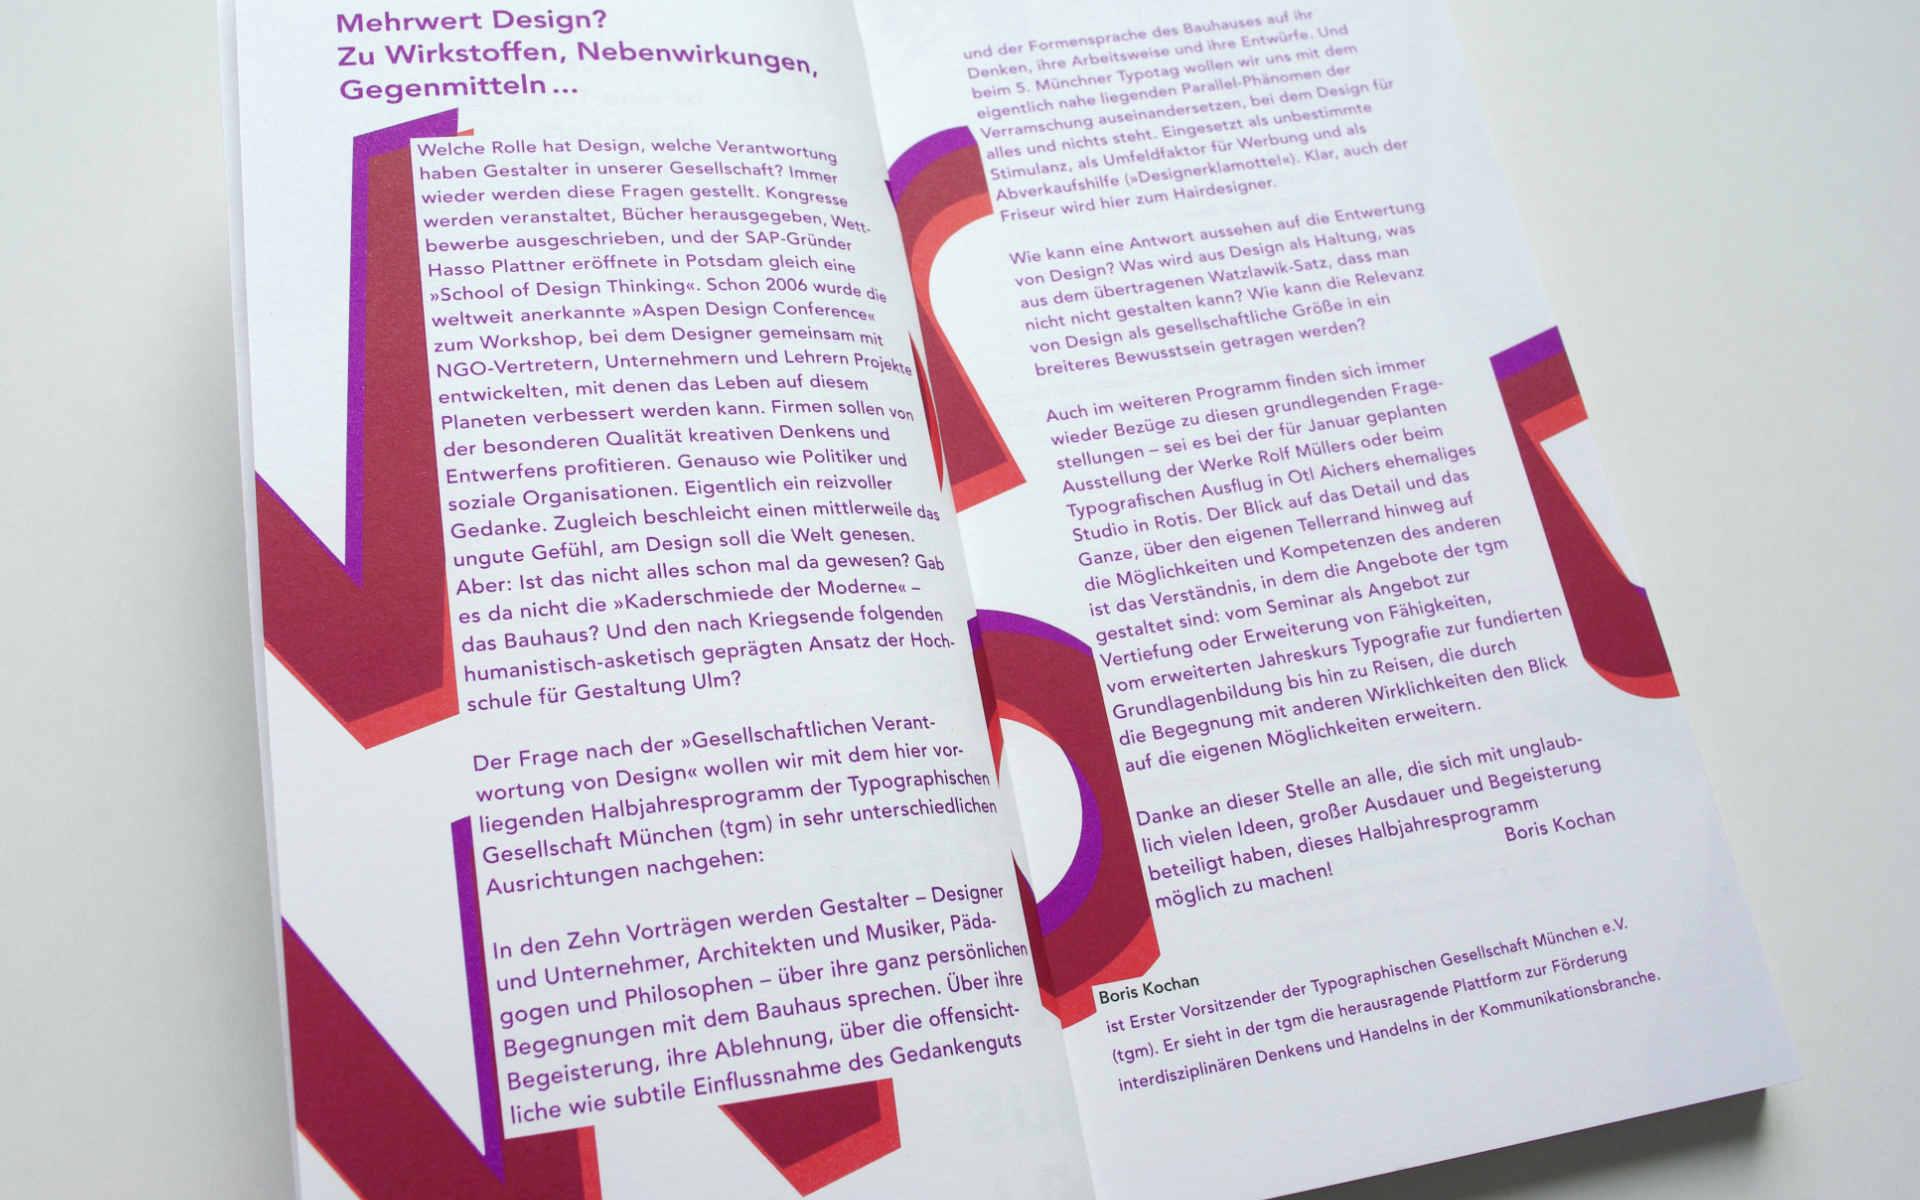 TGM Programm Typografie Grafik Design